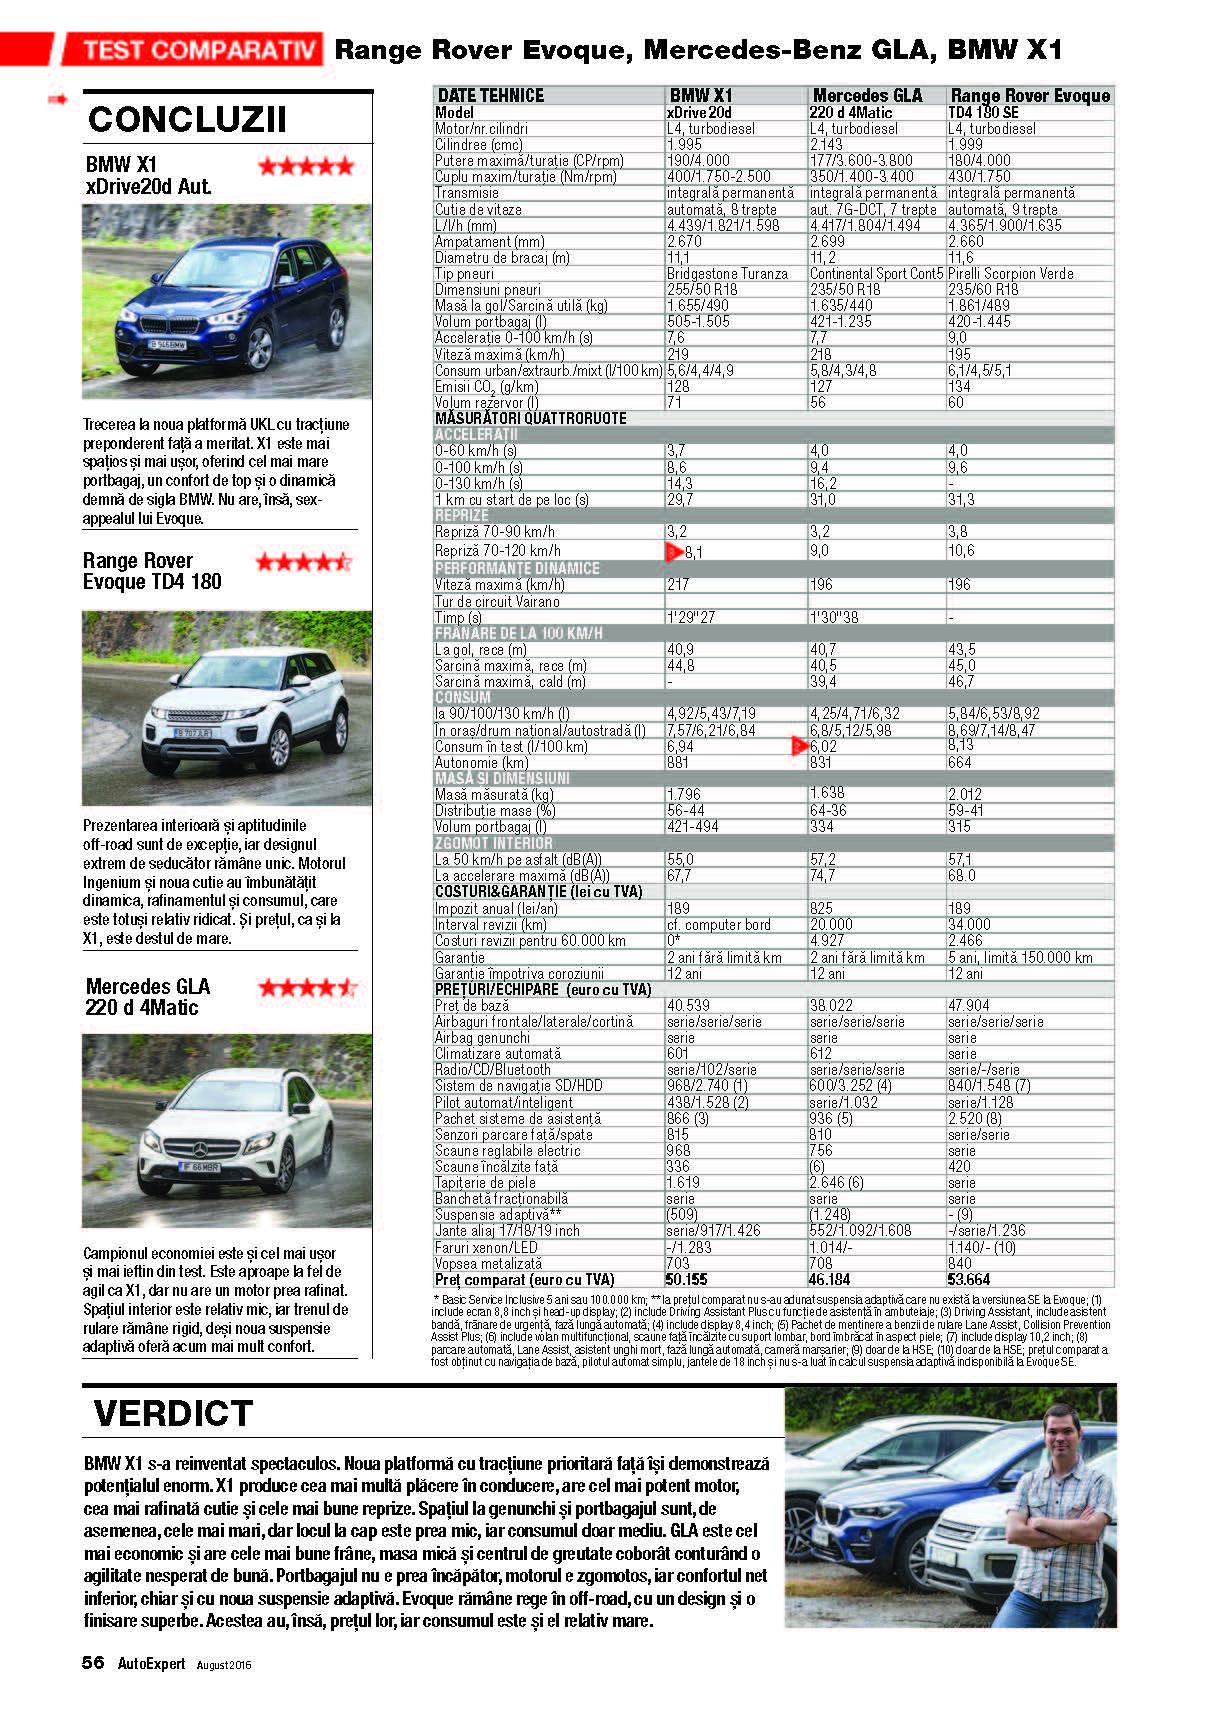 48-56_comp_evoque-gla-x1_R Toyota 9